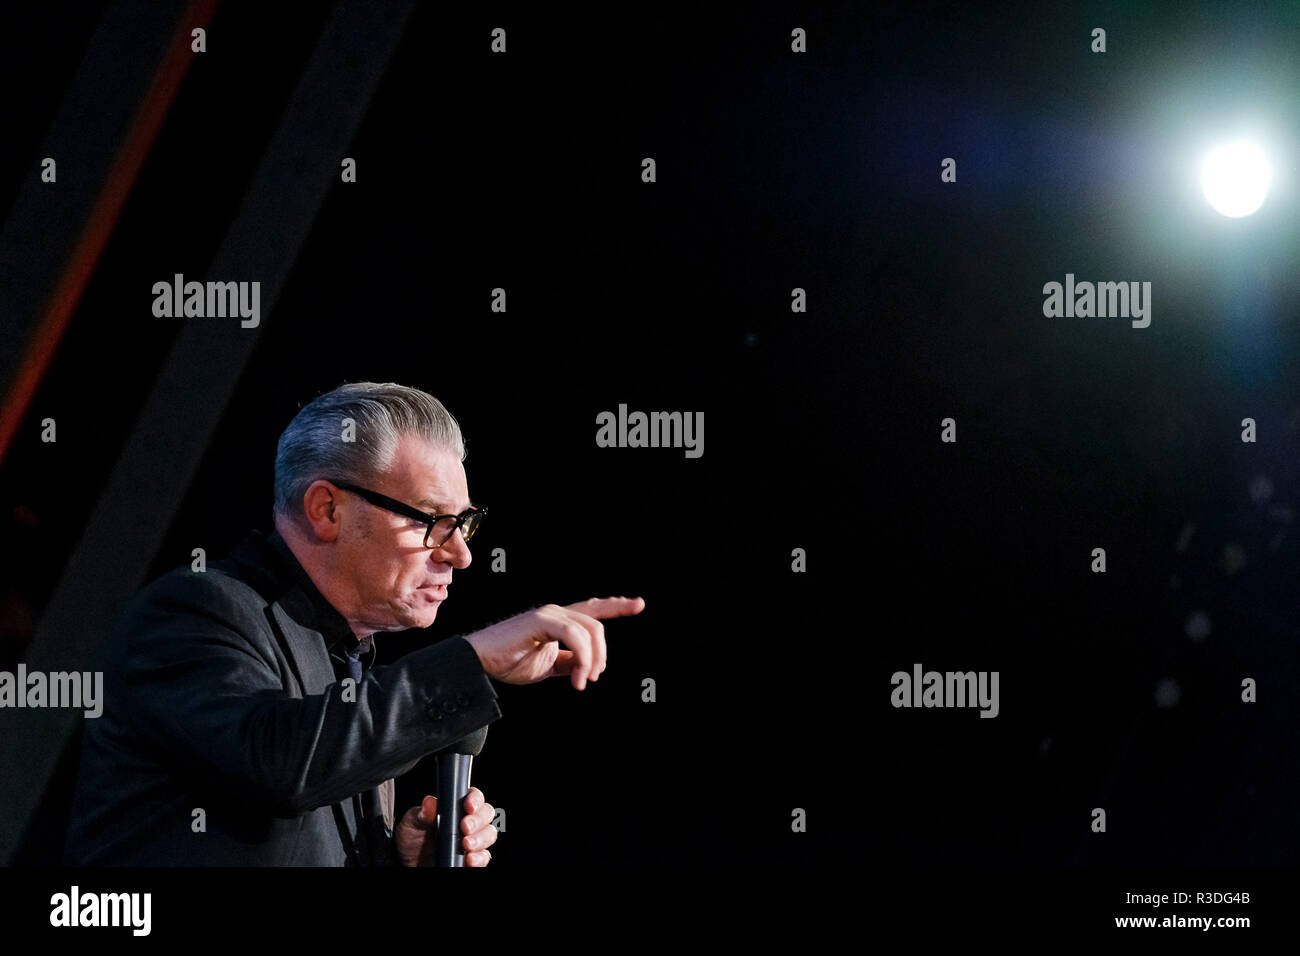 Mark Kermode erscheint auf Mark Kermode Leben in 3D am Montag, den 19. November 2018 BFI Southbank, London statt. Bild: Mark Kermode. Stockbild